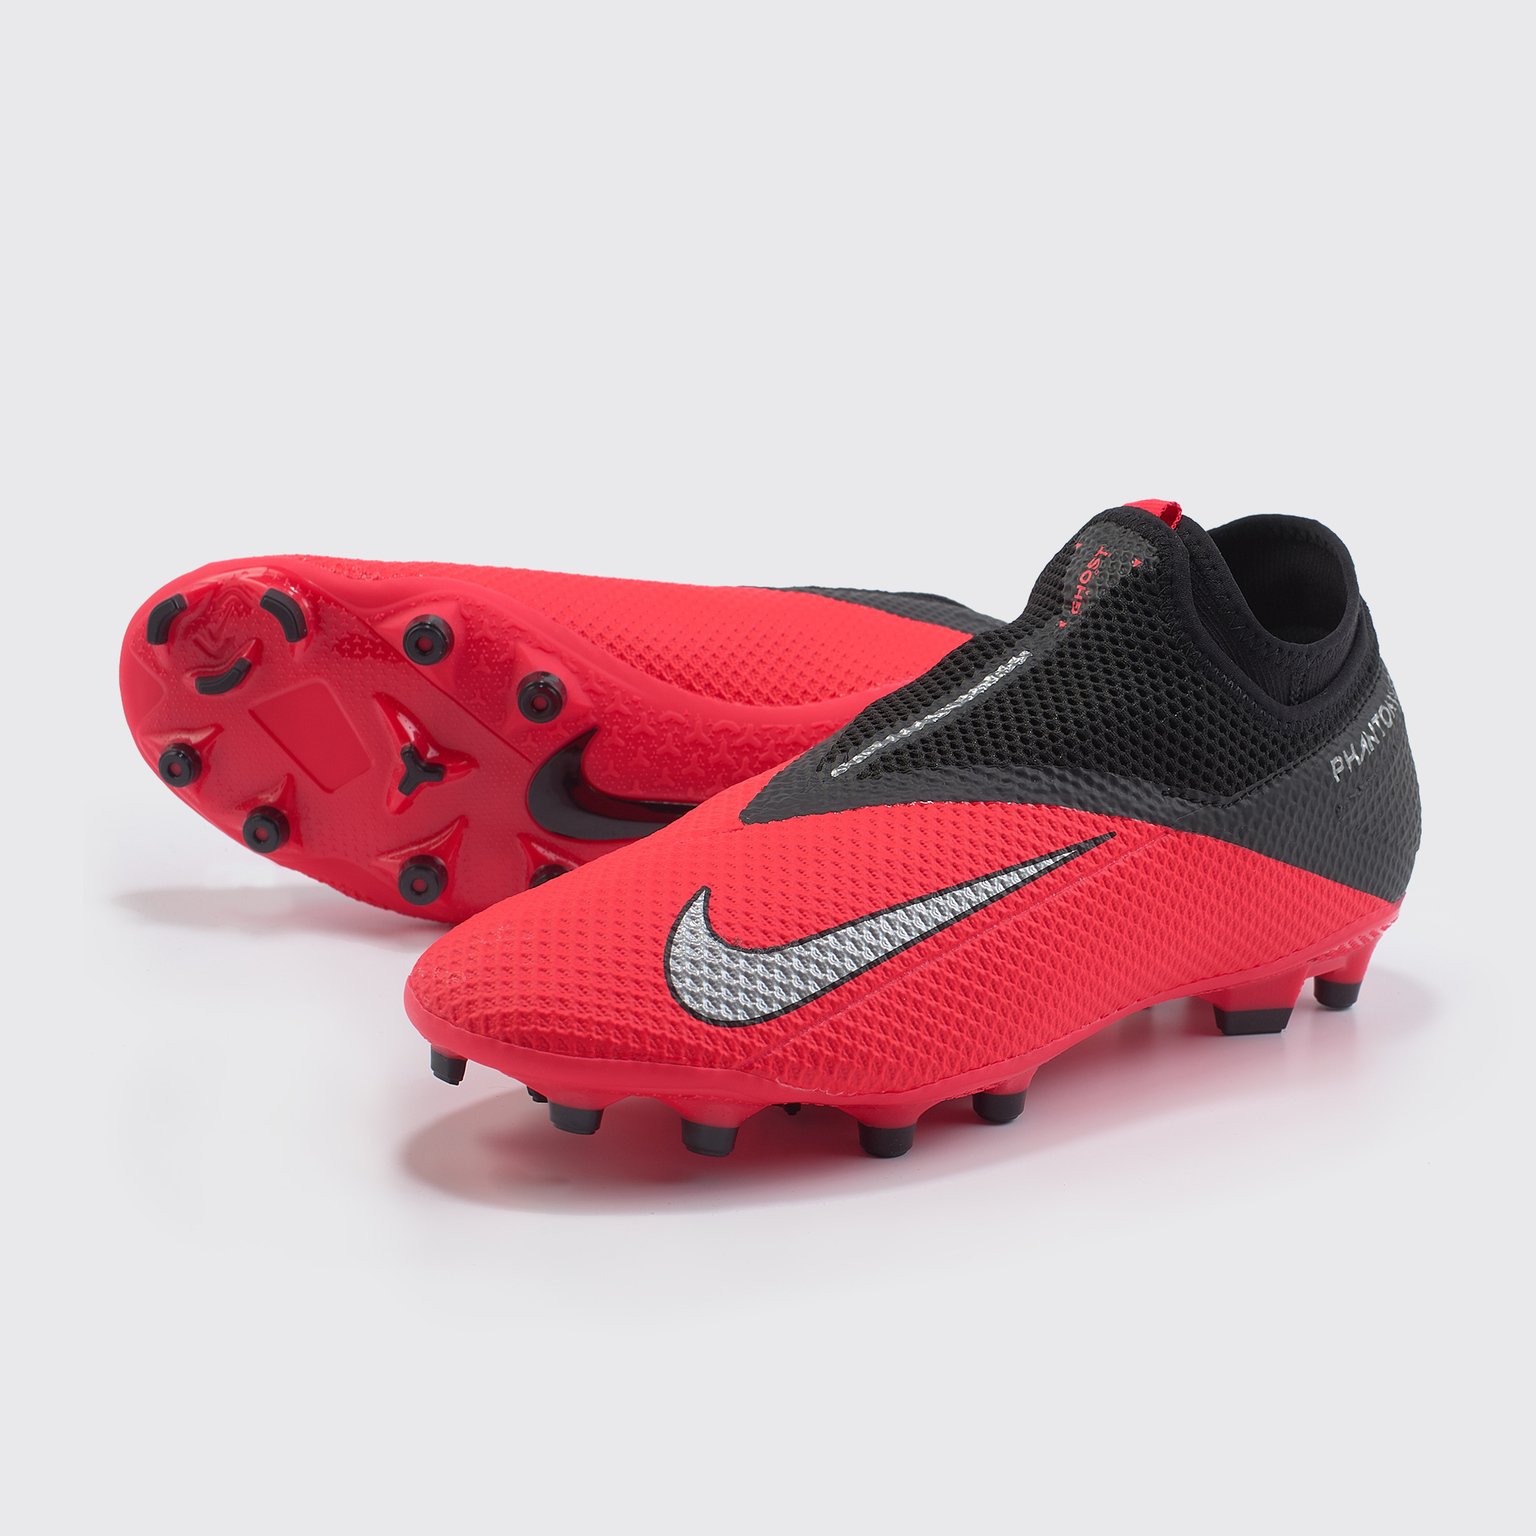 Бутсы Nike Phantom Vision 2 Academy DF FG/MG CD4156-606 шиповки детские nike phantom vision 2 academy df tf cd4078 606